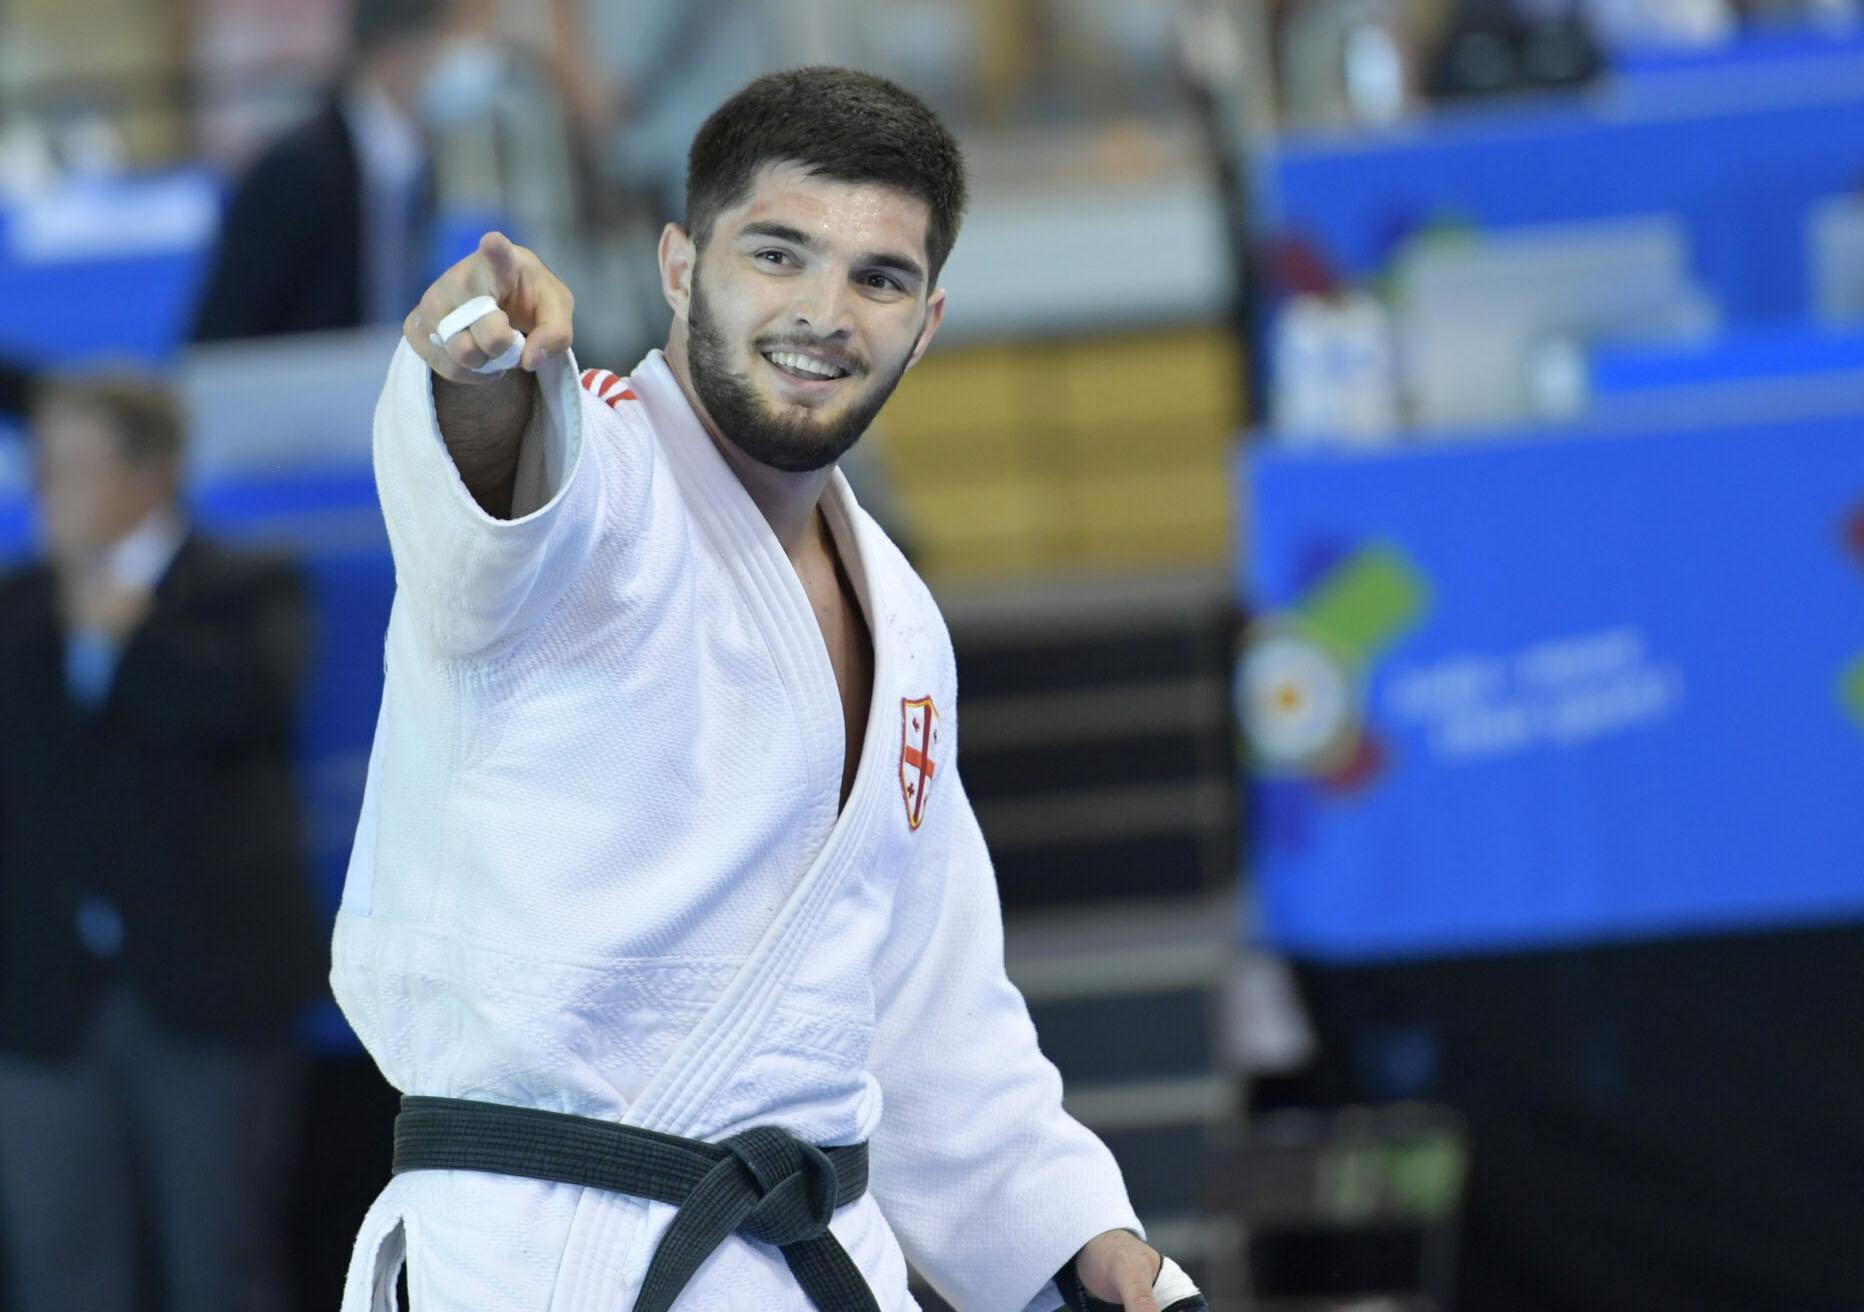 Nika Kharazishvili is the European Champion